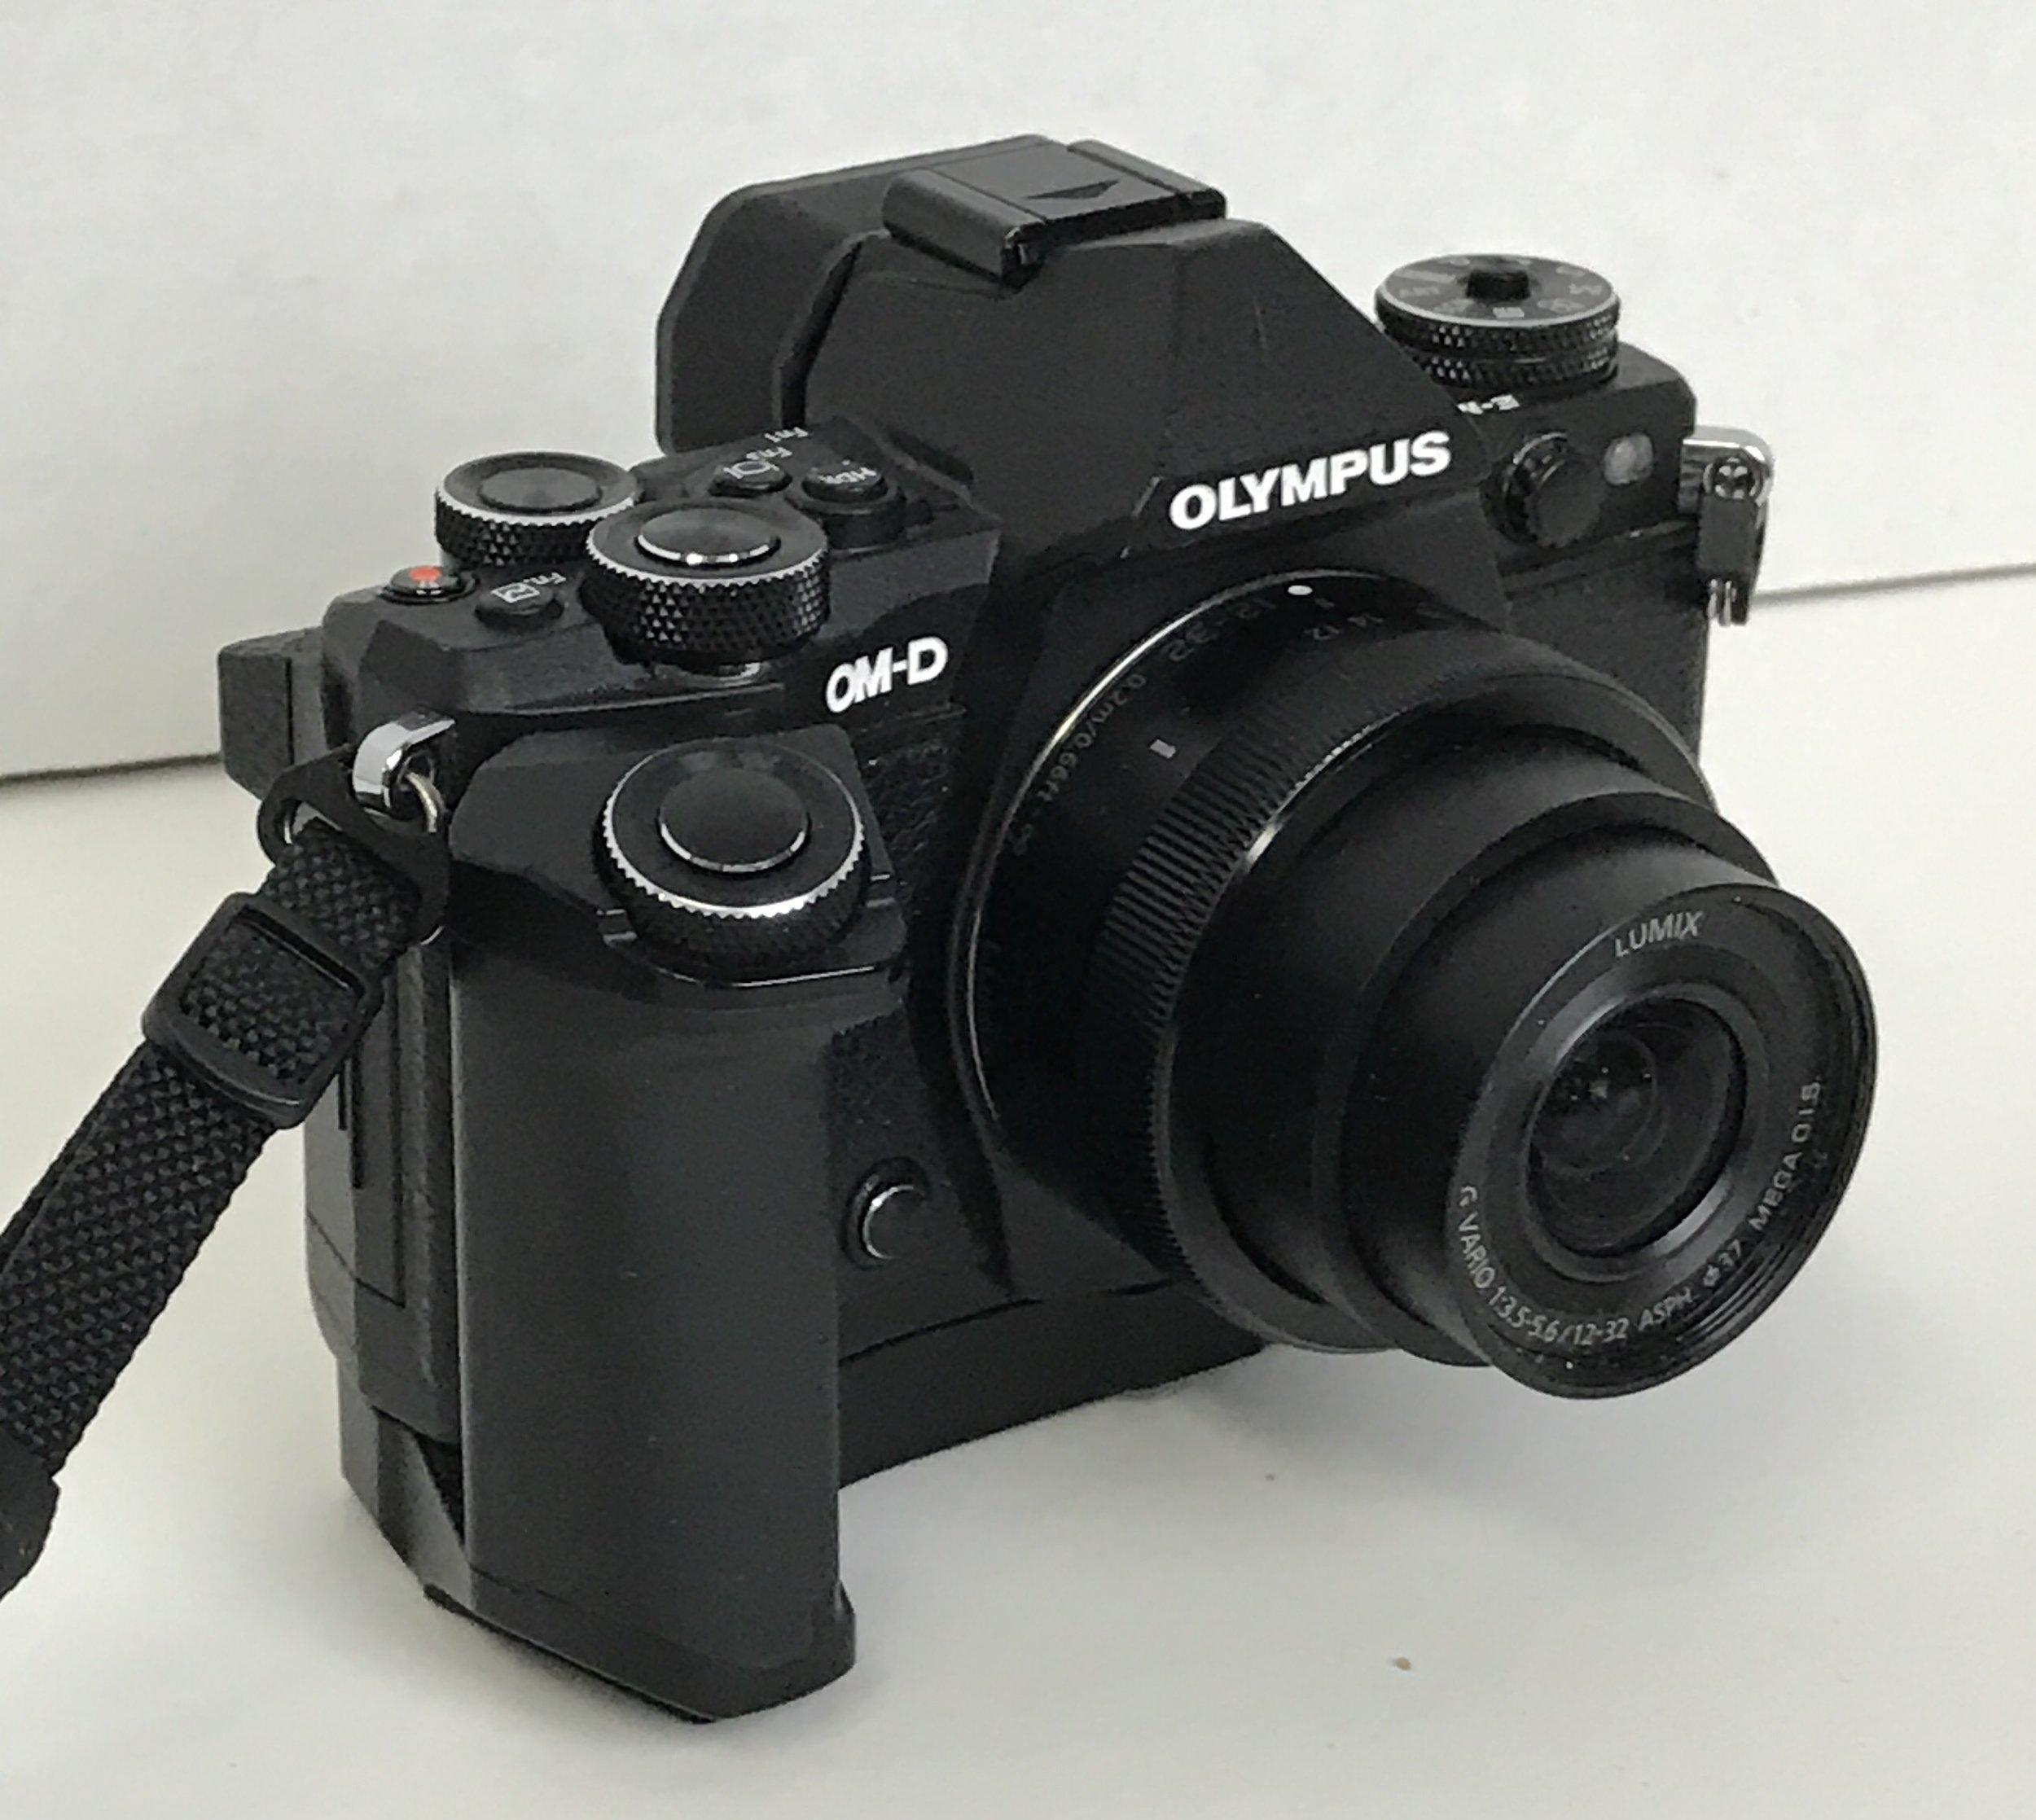 Olympus OM-D E-M5 Mark II with the Panasonic 12-32mm, f/3.5-5.6 lens.